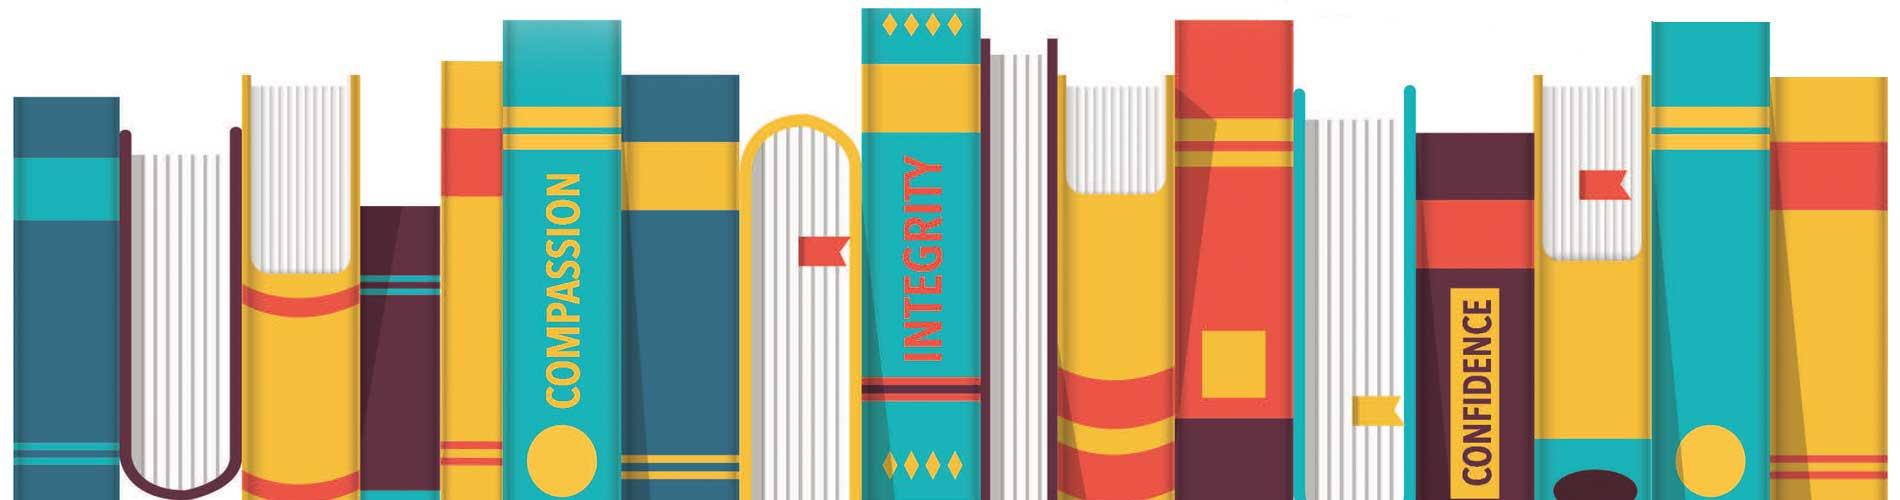 Instilling passion books